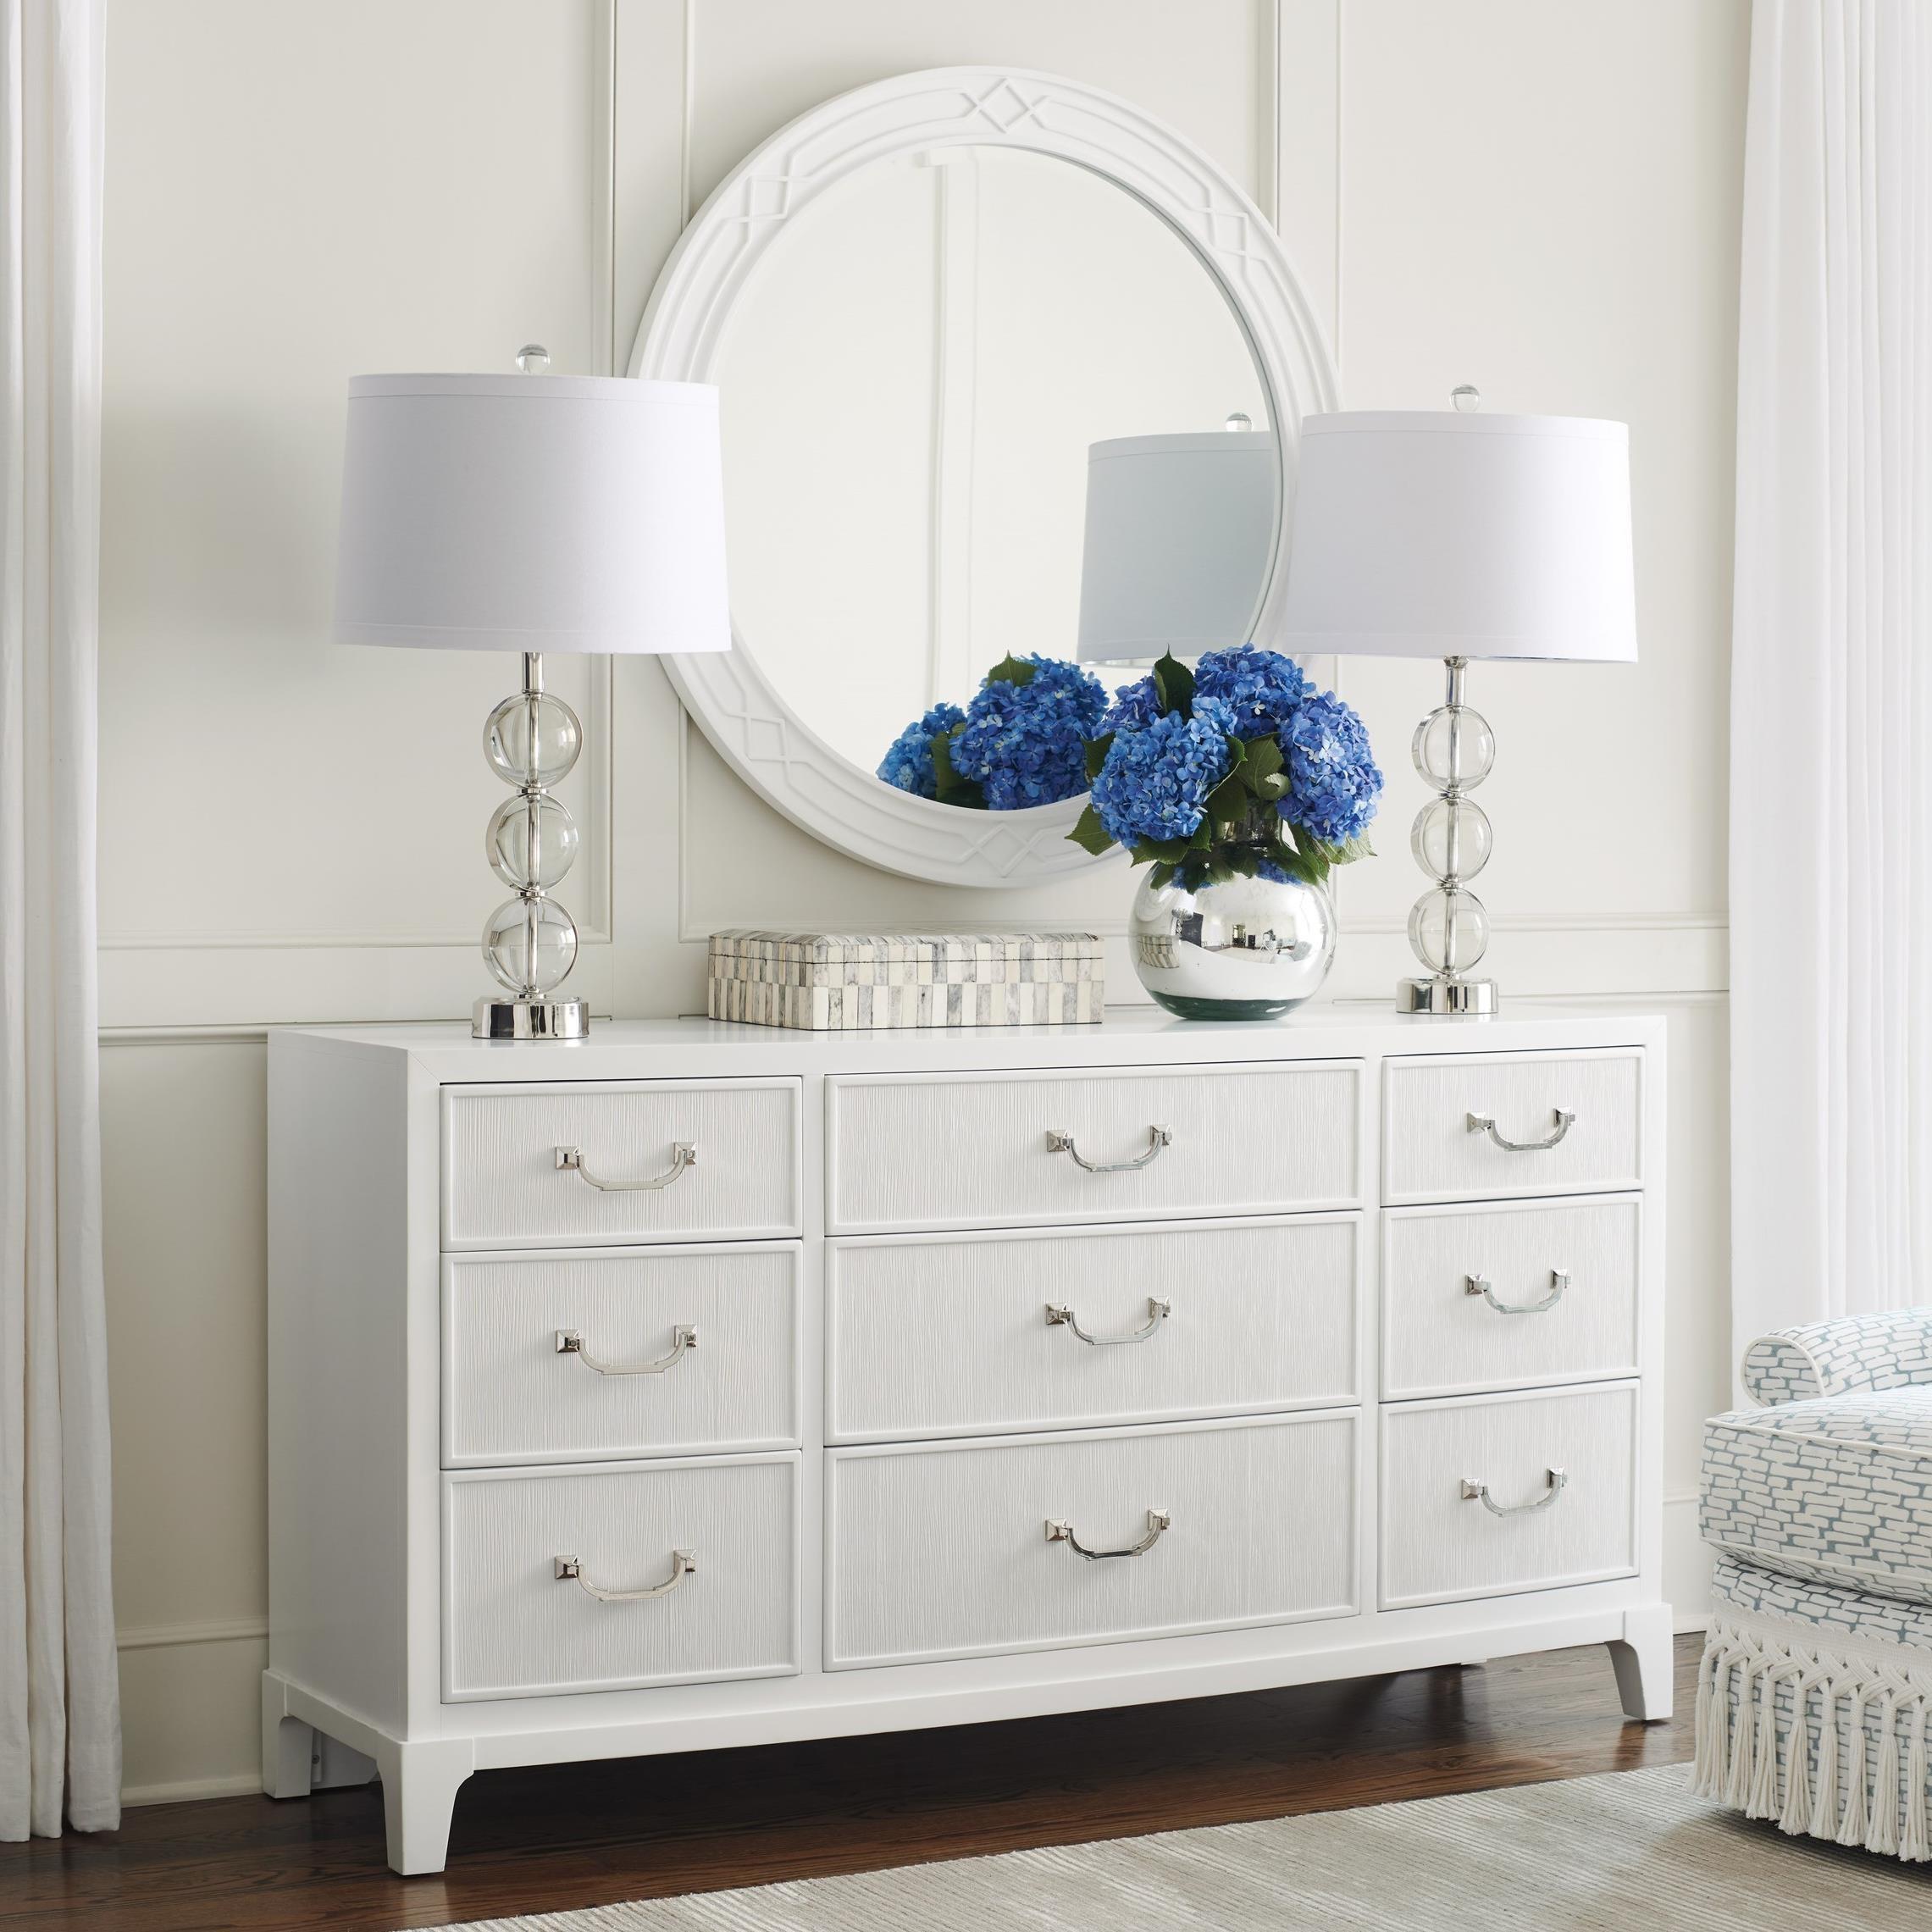 Avondale Silver Lake Dresser & Mirror Set by Lexington at Baer's Furniture